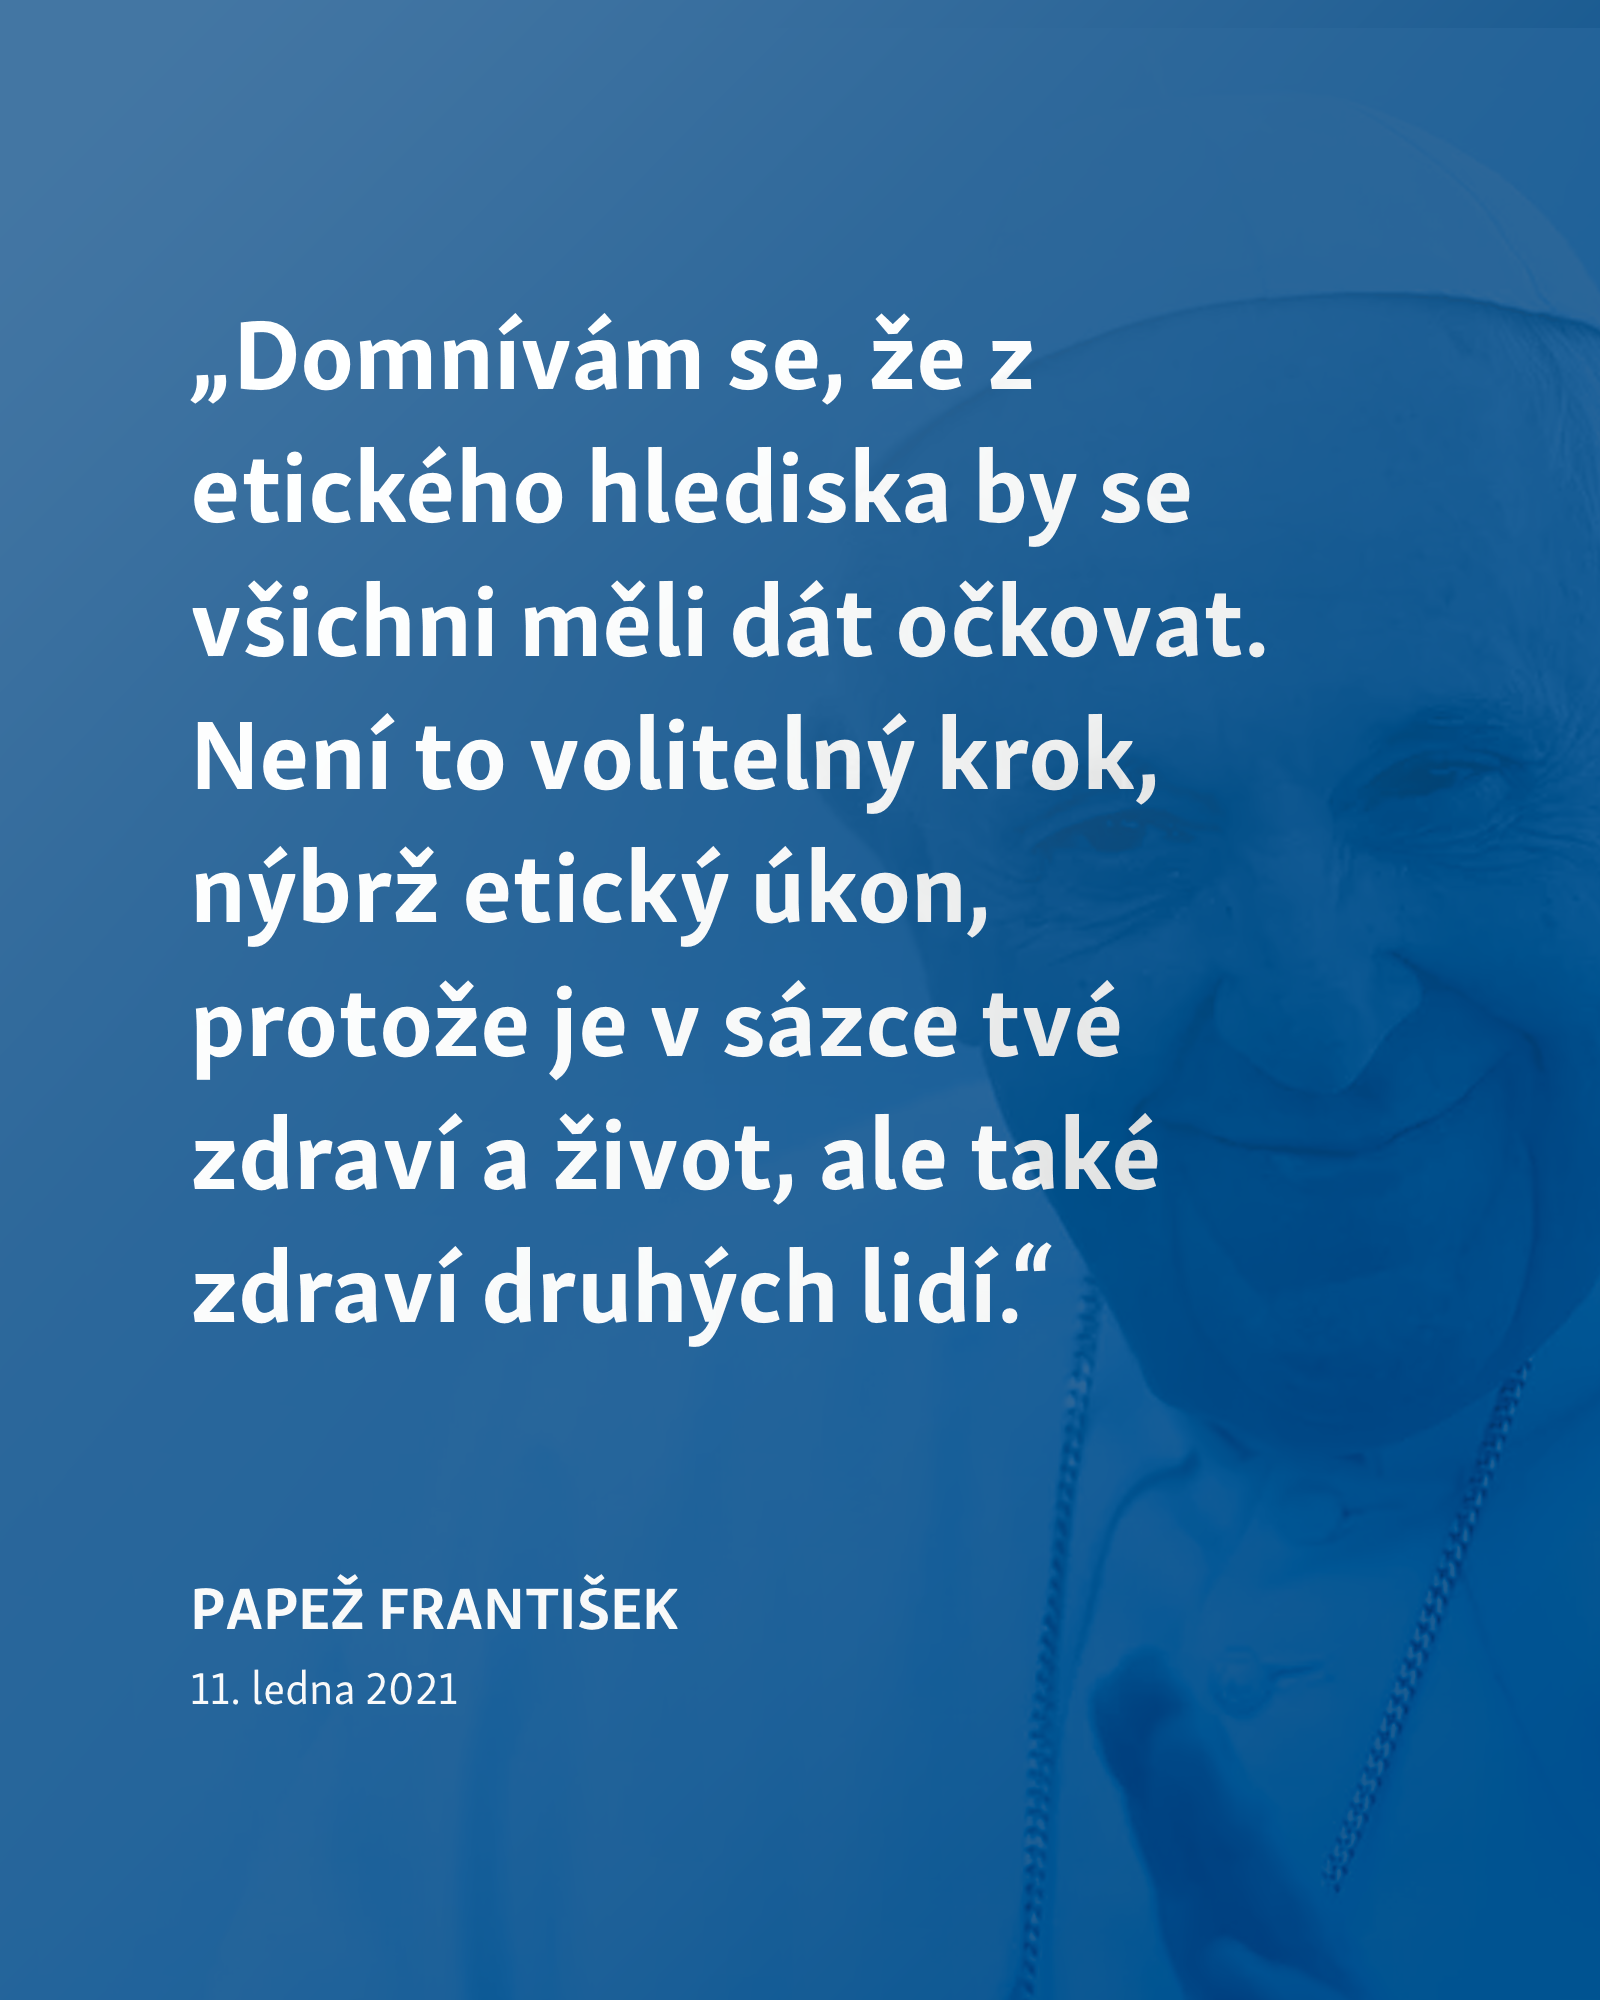 ockovani_frantisek_2